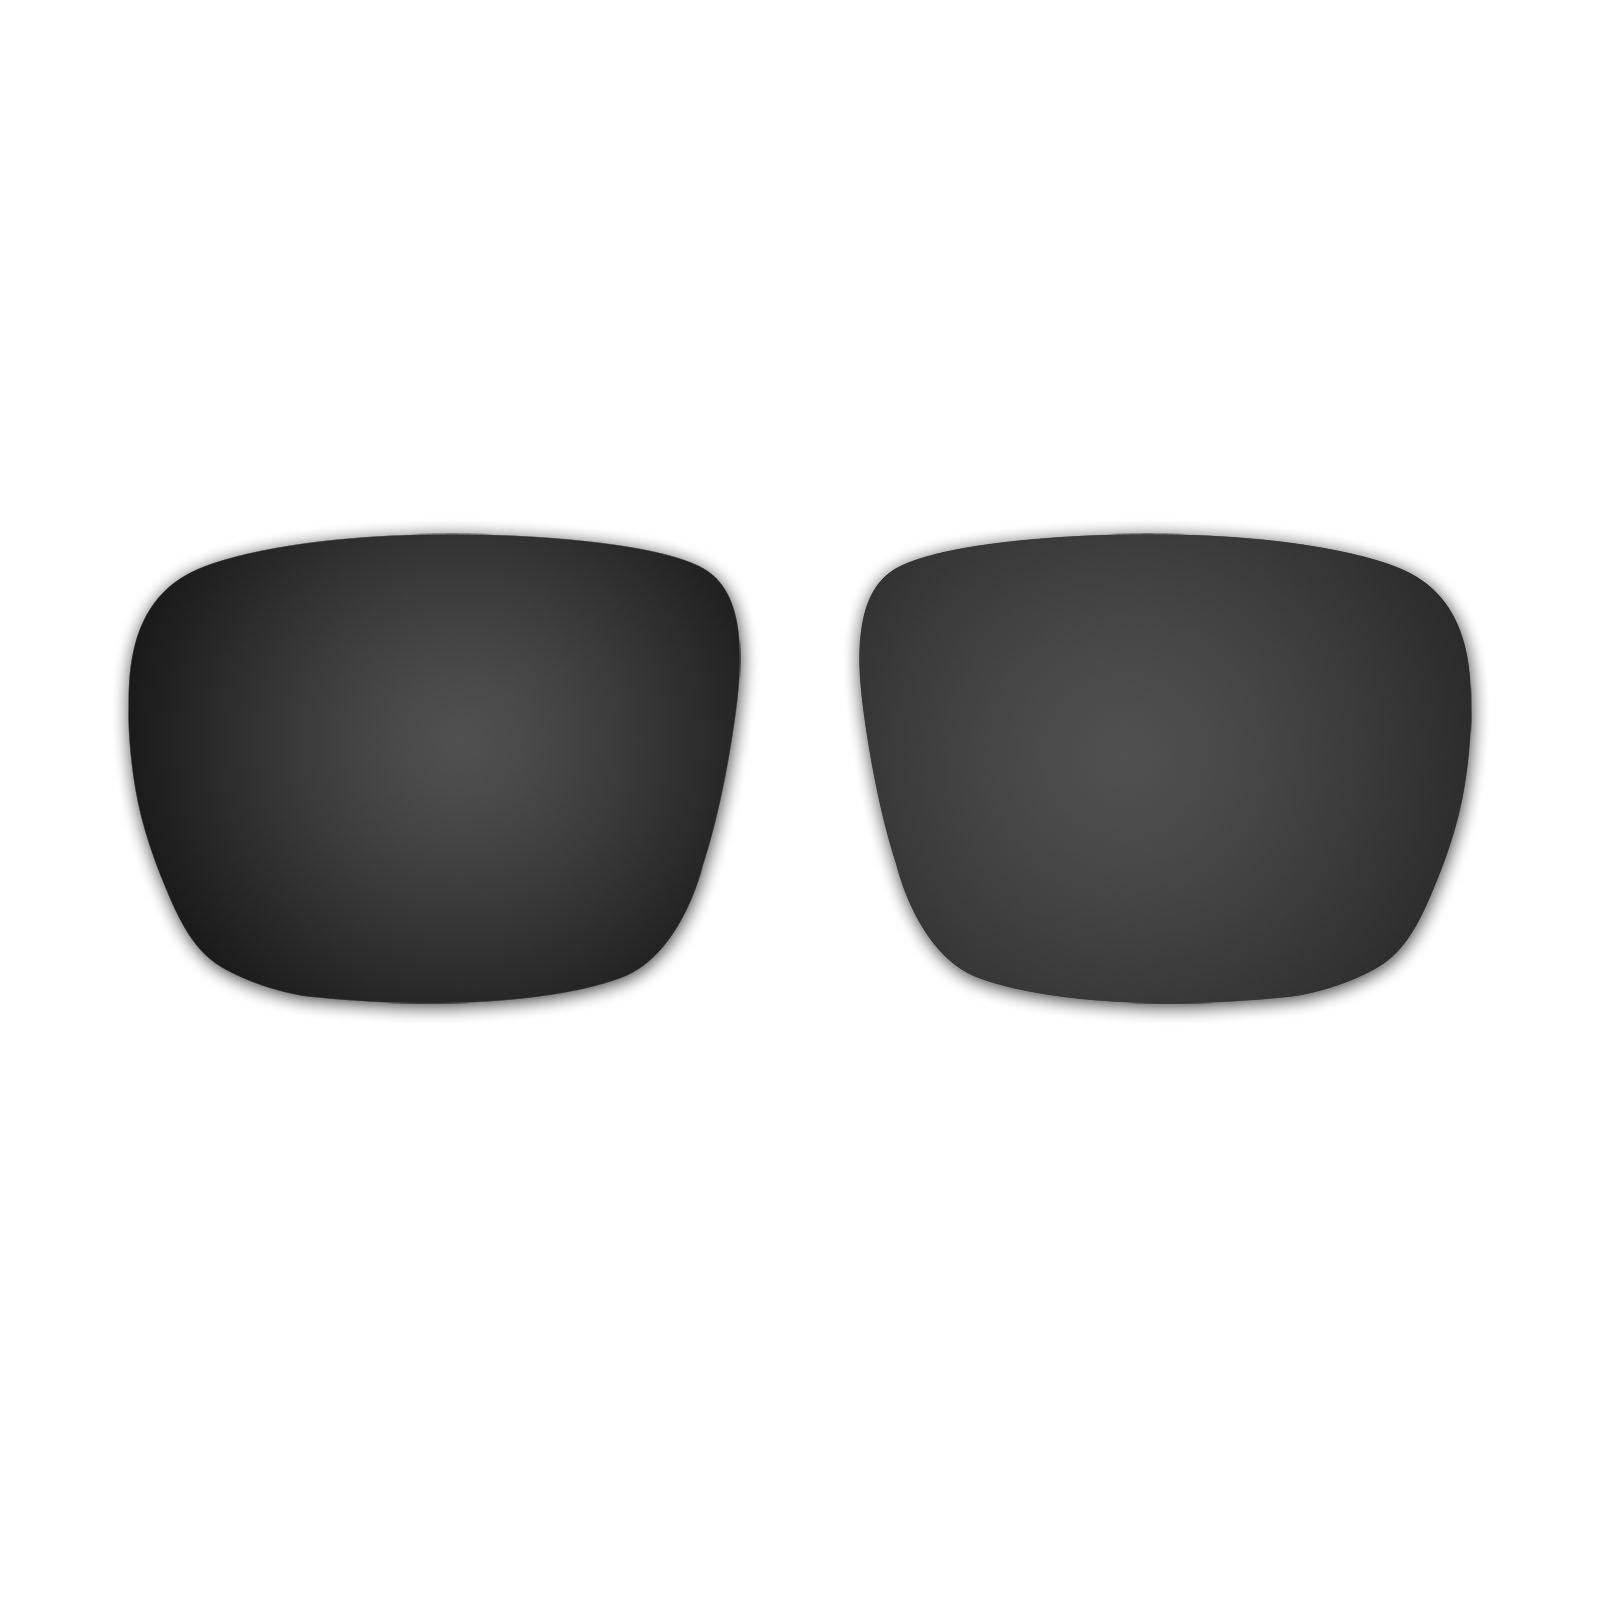 Polarized Replacement Sunglasses Lenses for Spy Optic Spy Helm - Black